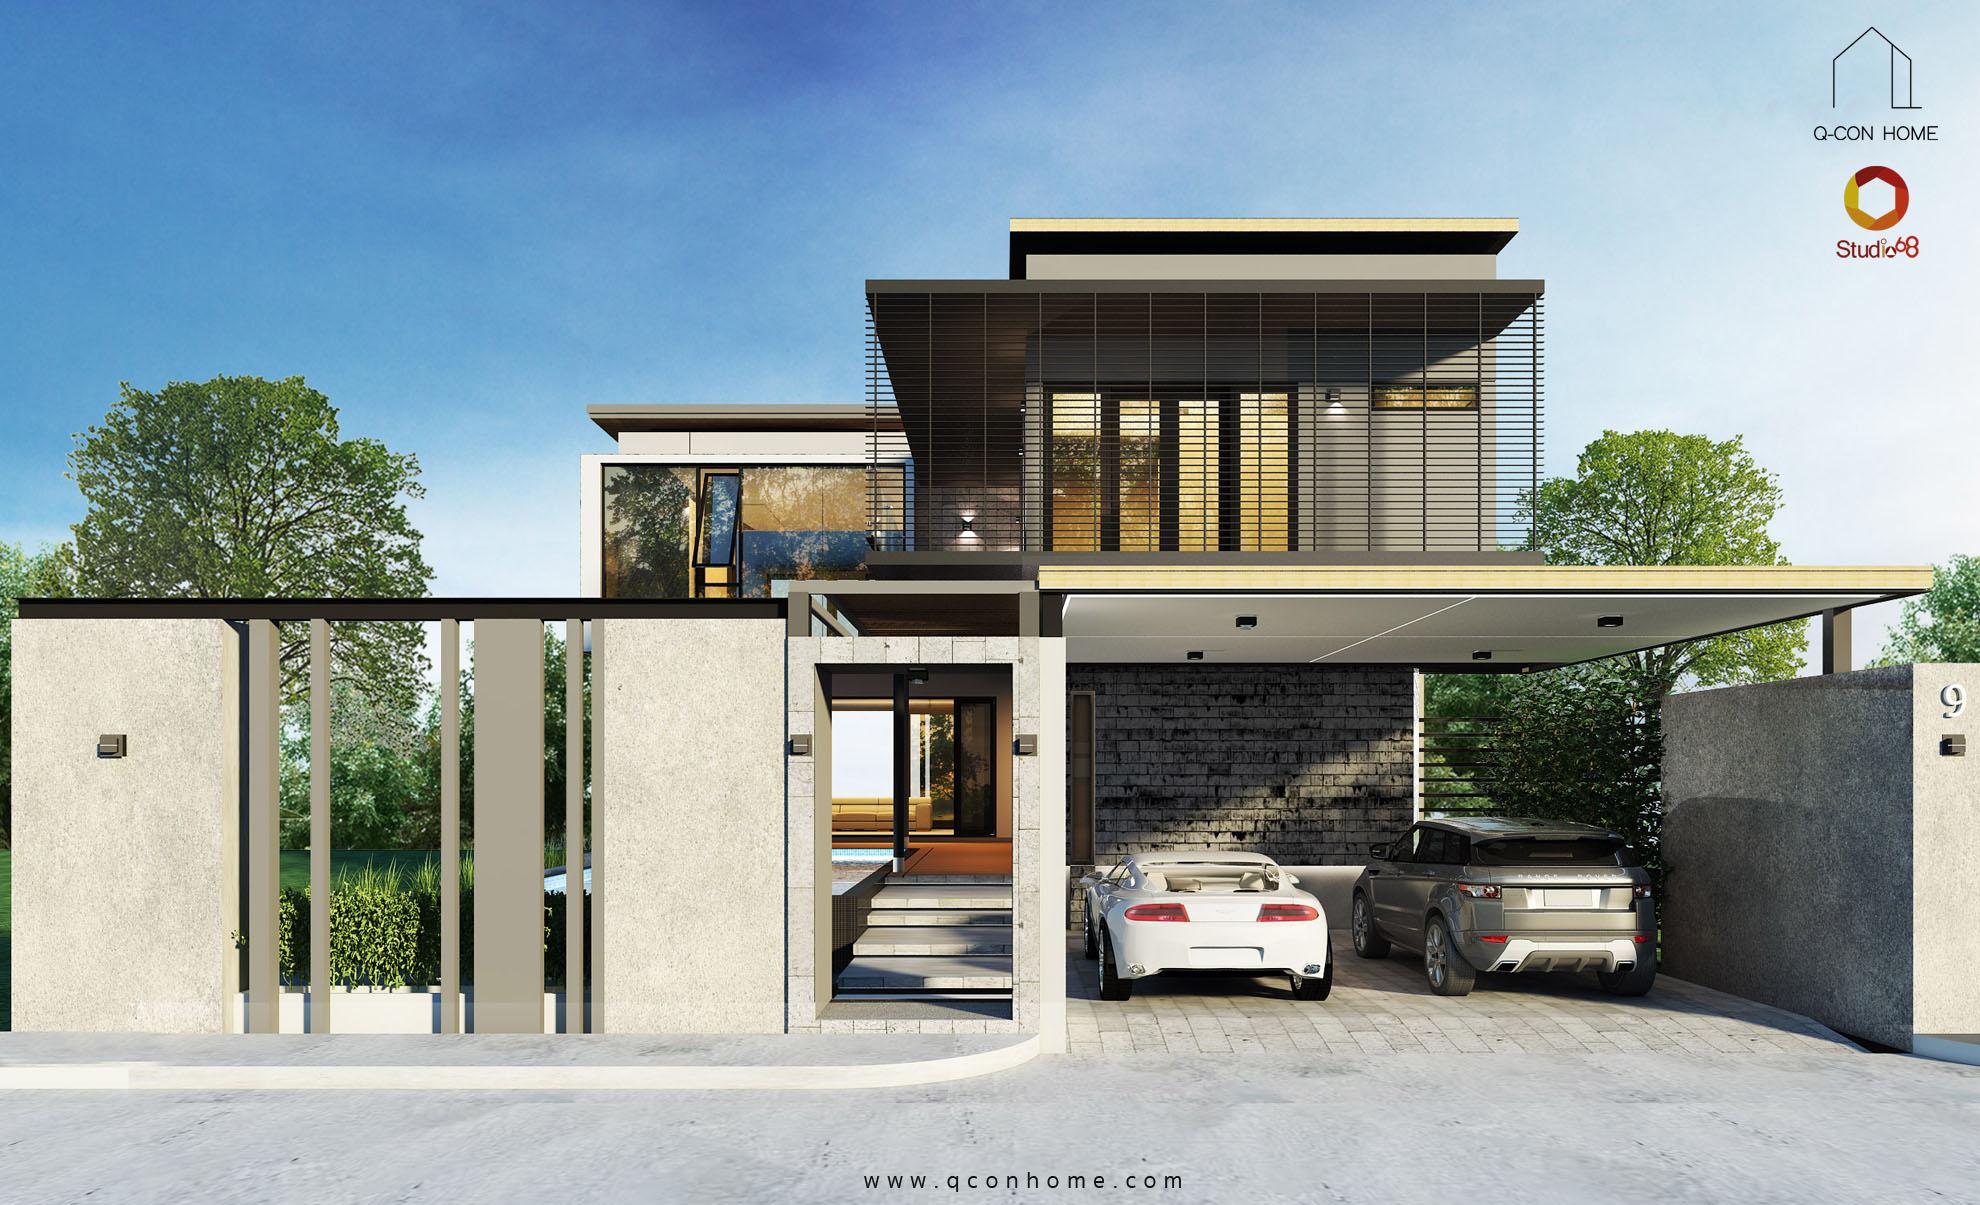 Modern-loft-house-1-architecture-qconhome-contractor